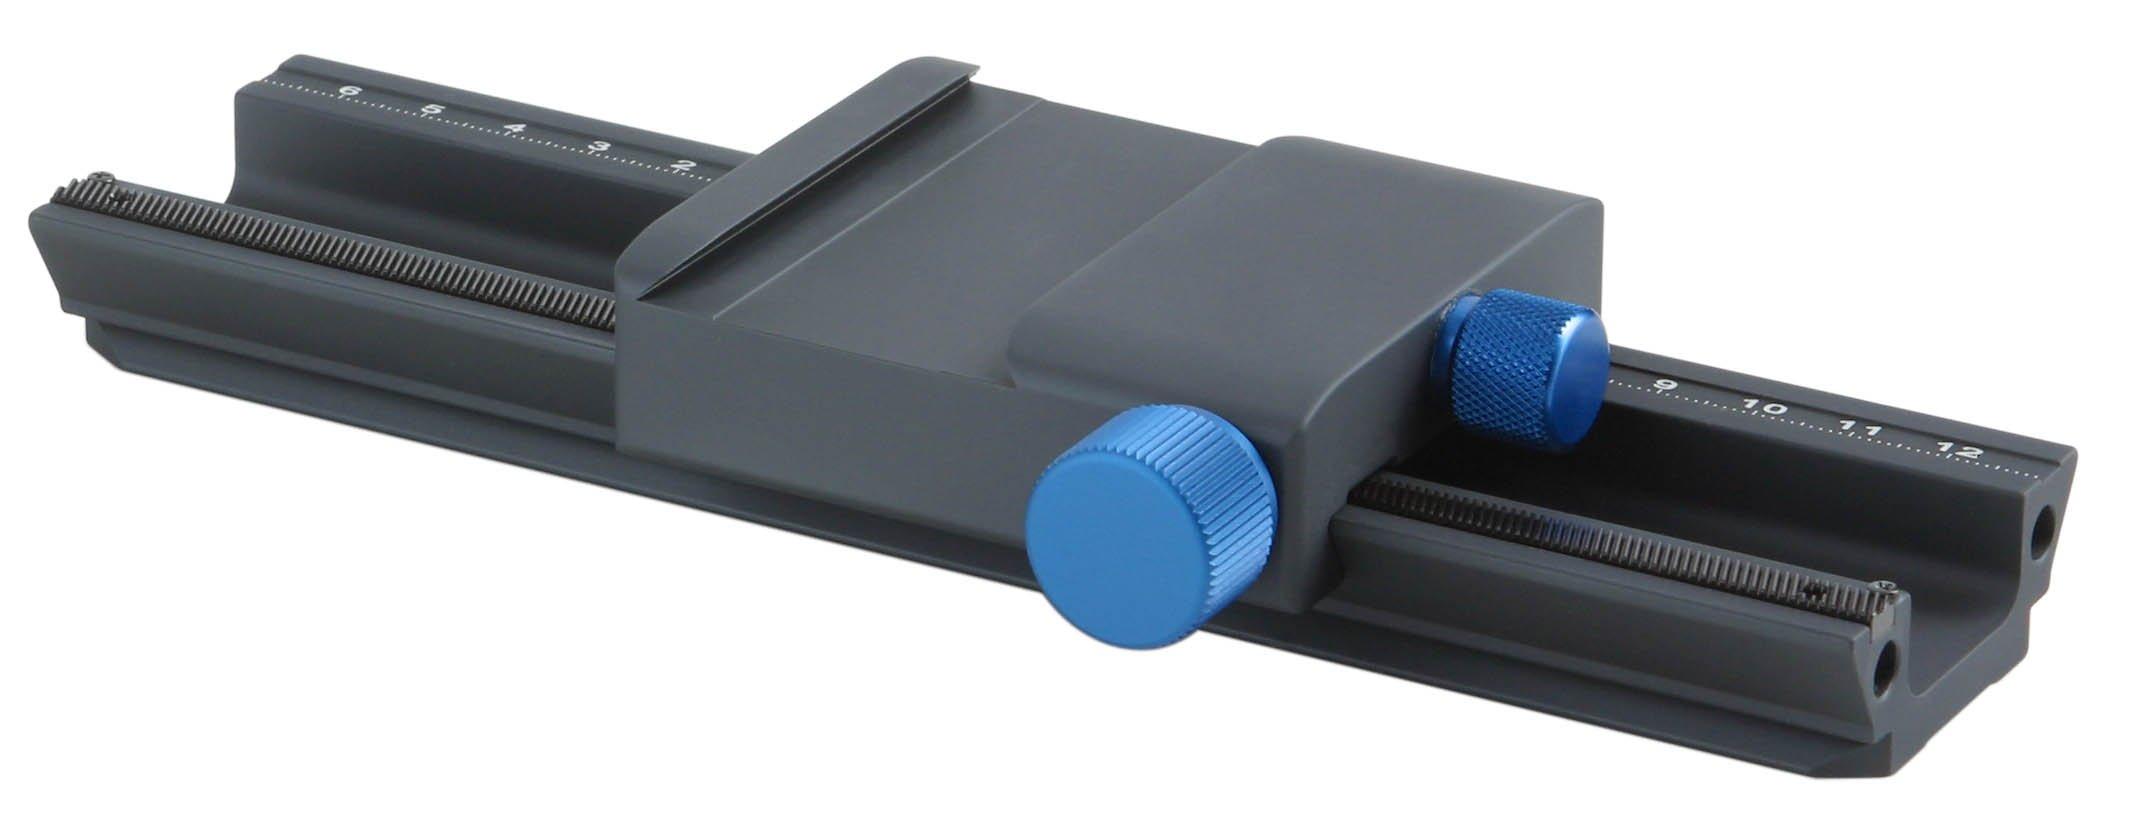 Novoflex Q System Focusing Rack with Quick Release Base (CASTEL-Q) by Novoflex